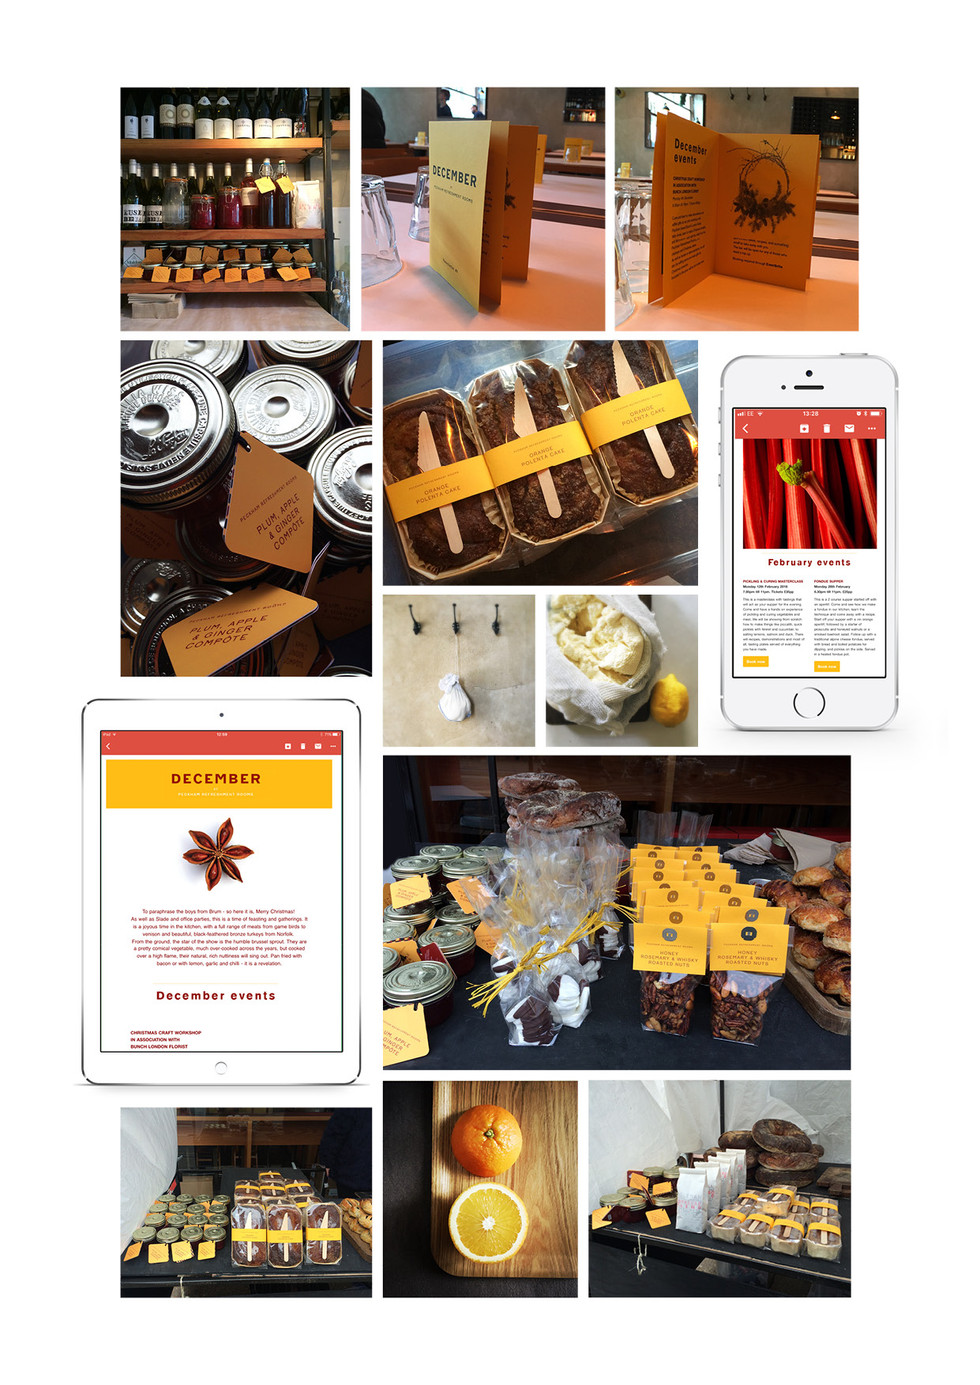 PECKHAM REFRESHMENT ROOMS | Brand development for restaurant across packaging, print and digital newsletters